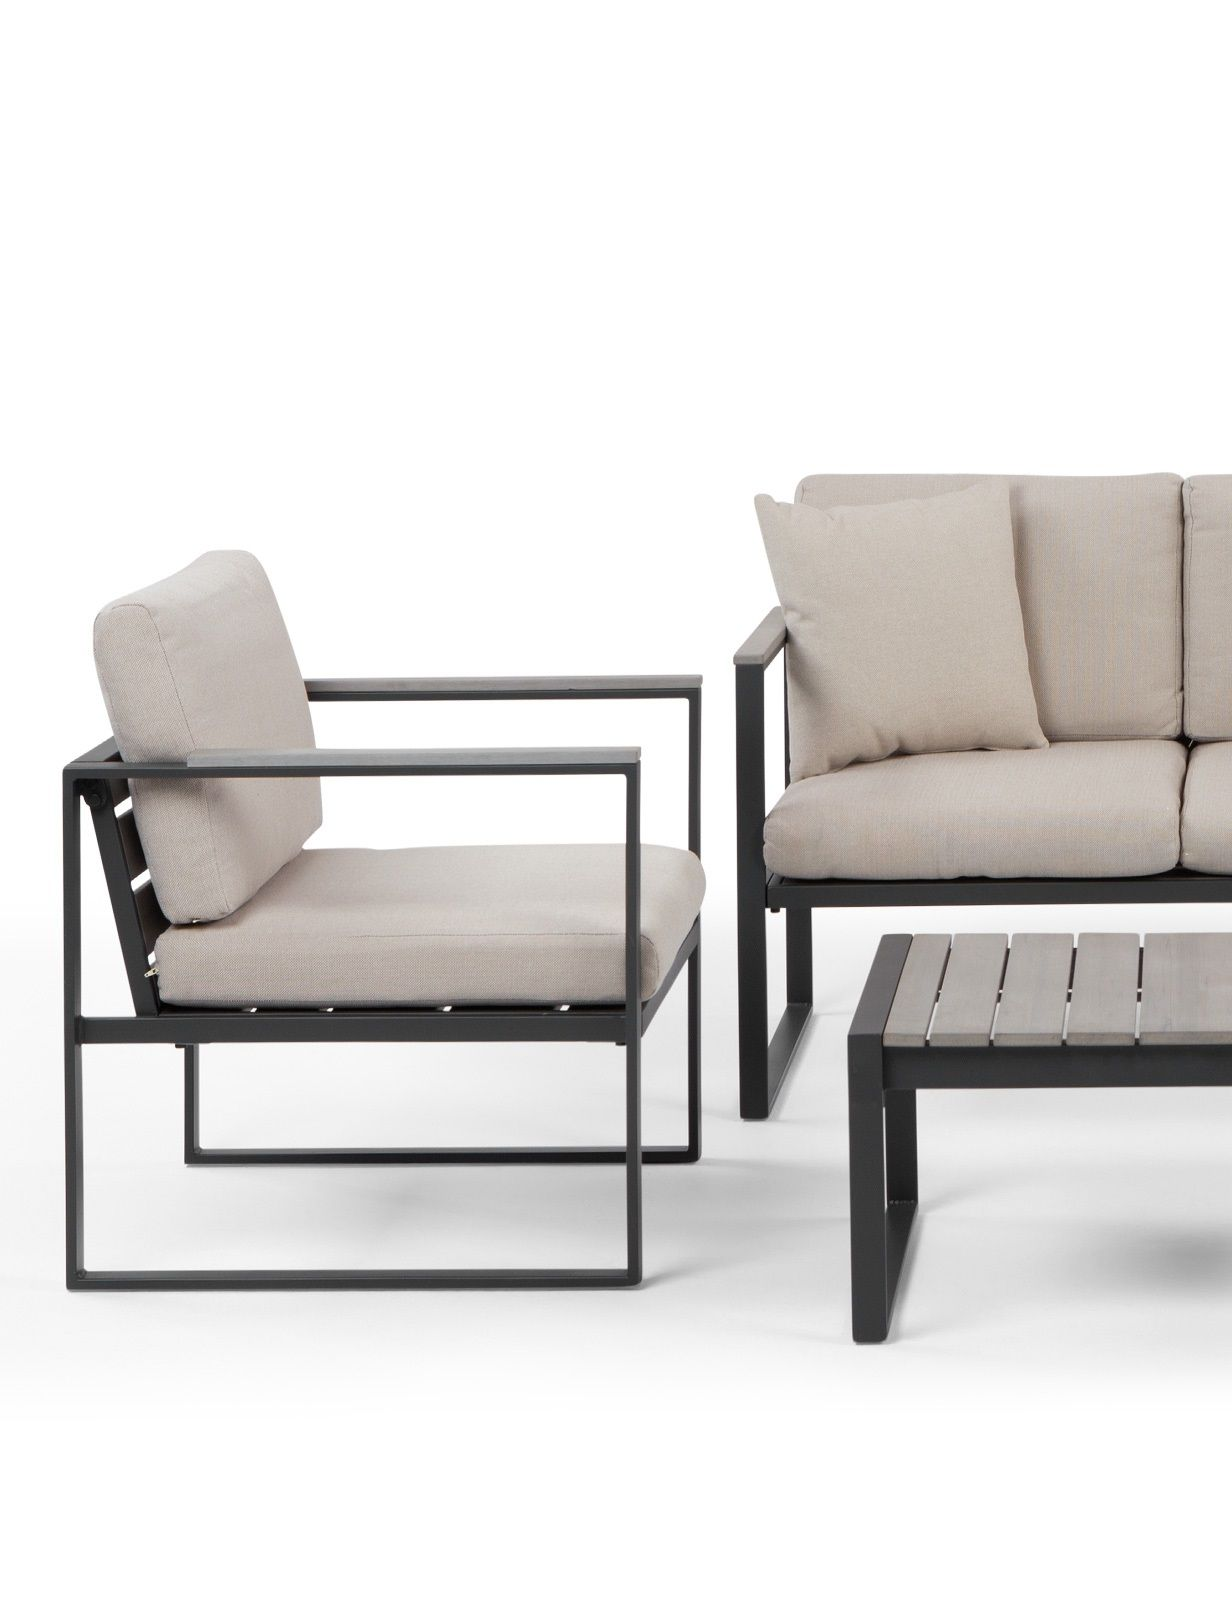 Catania Garden Lounge Set, Polywood  Loft interiors, Stylish